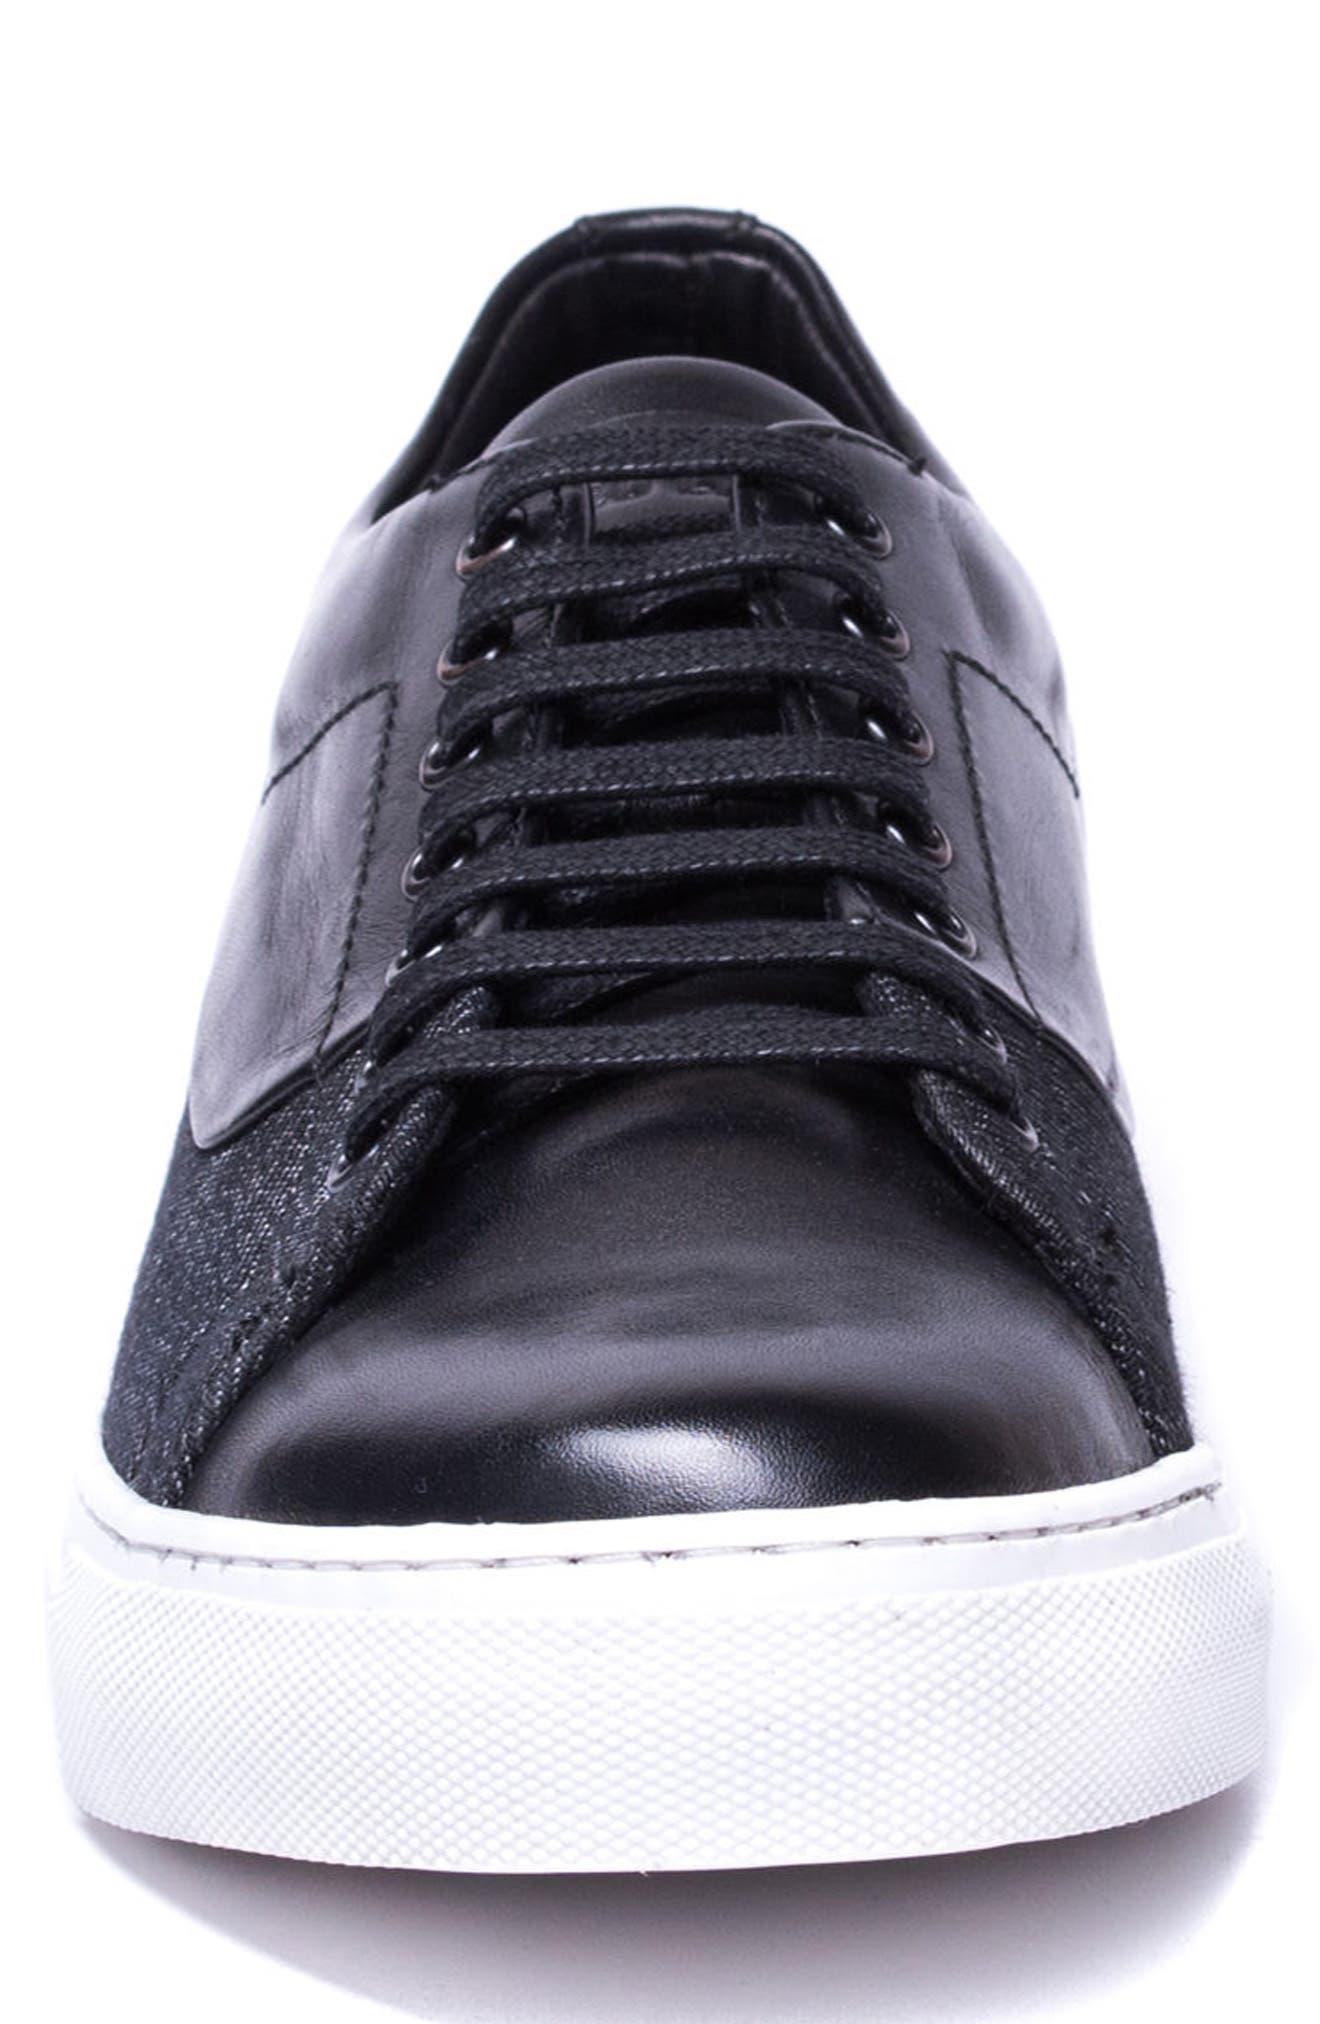 Luke Low Top Sneaker,                             Alternate thumbnail 4, color,                             Black Leather